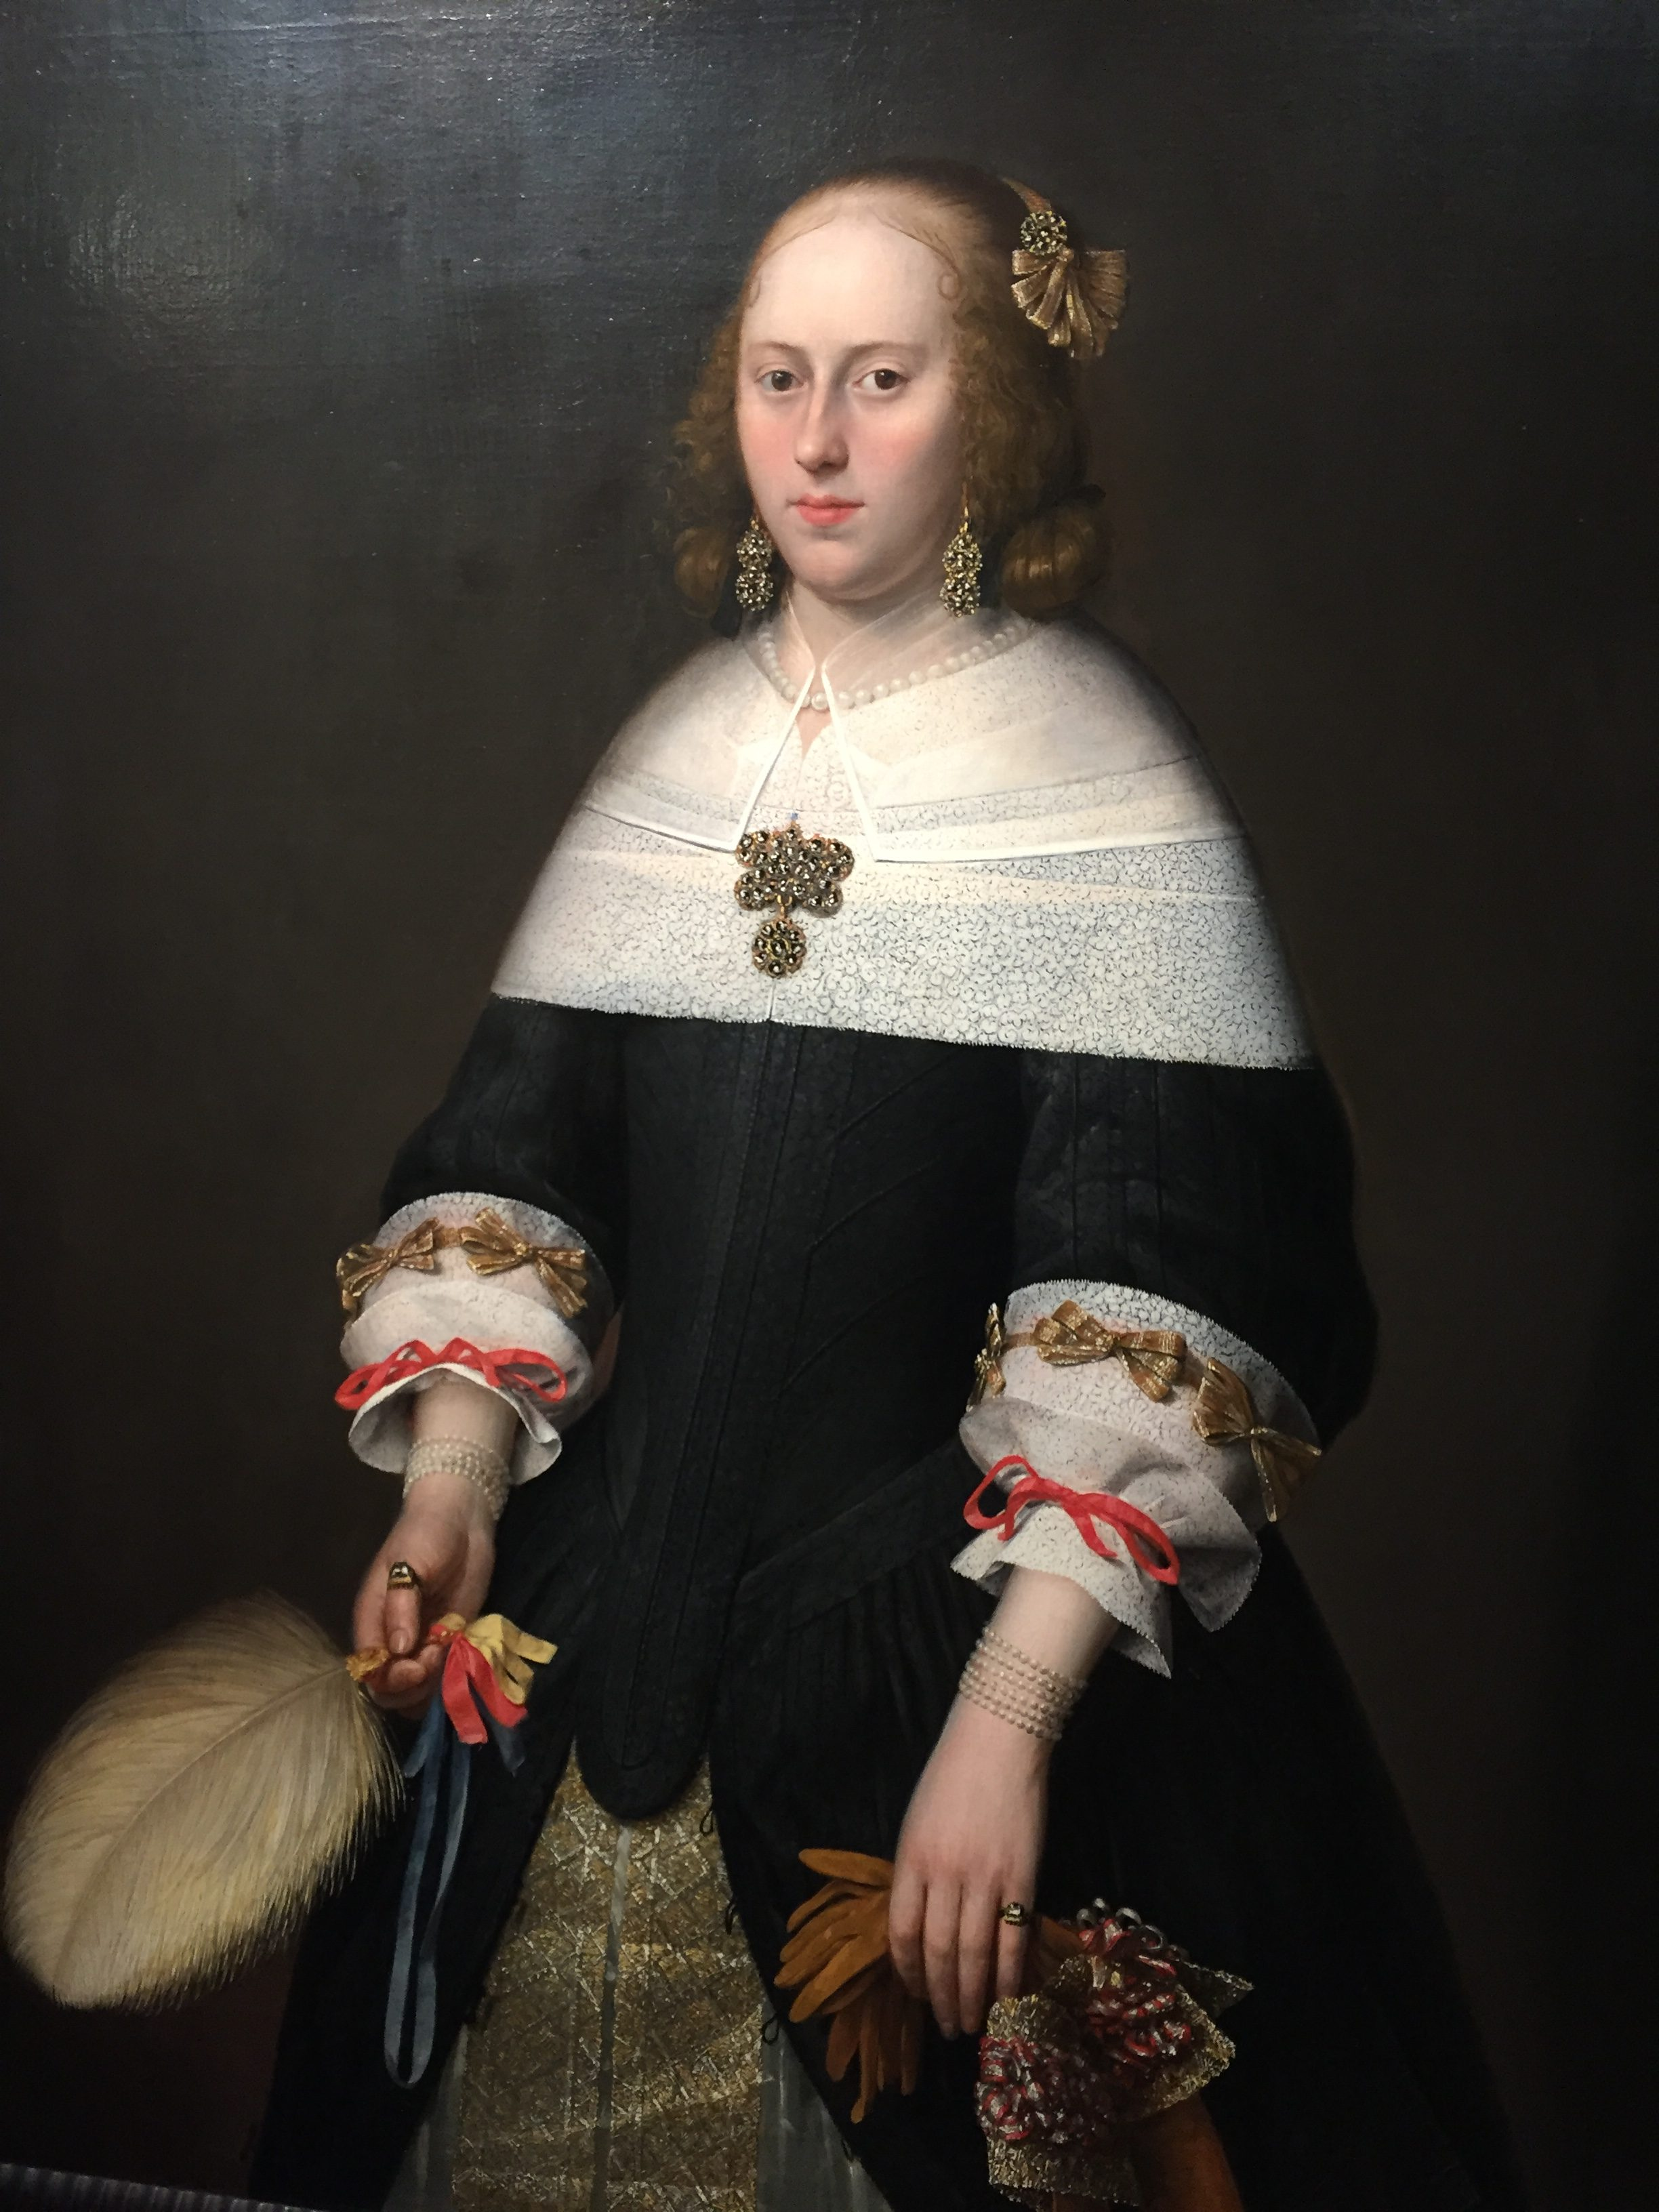 Guided Tour Hoorn: Portrait of Brigitta de Groot